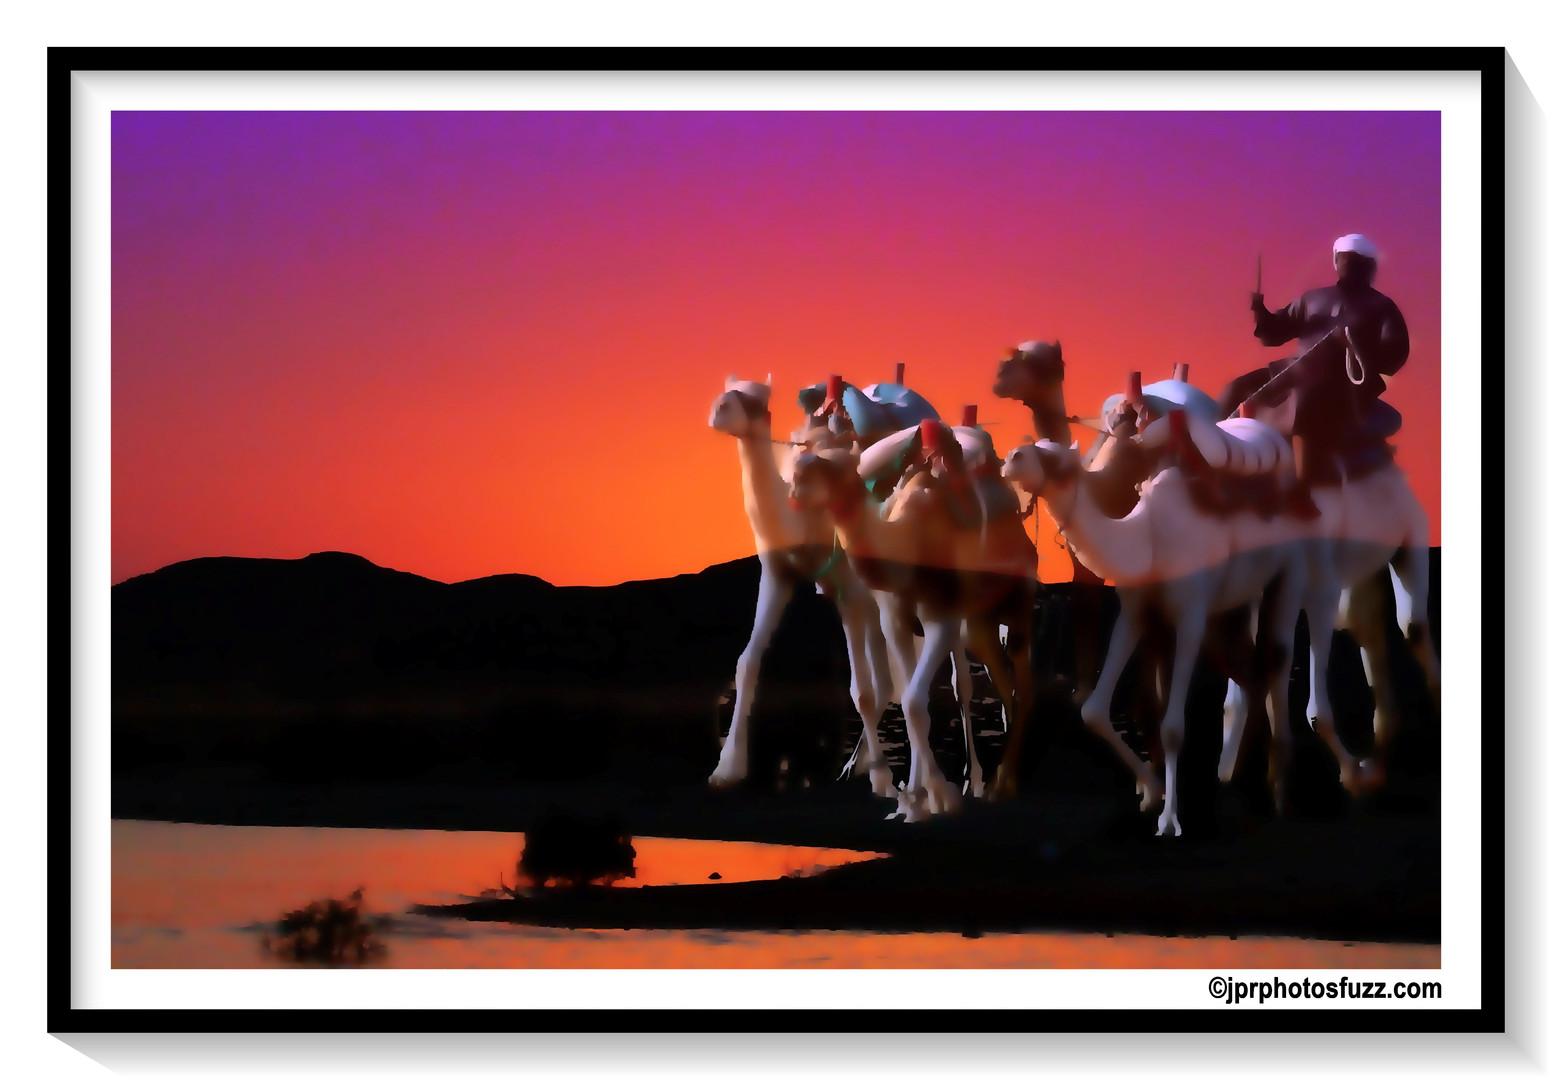 ABOU SINBEL Camel 1 - Egypte